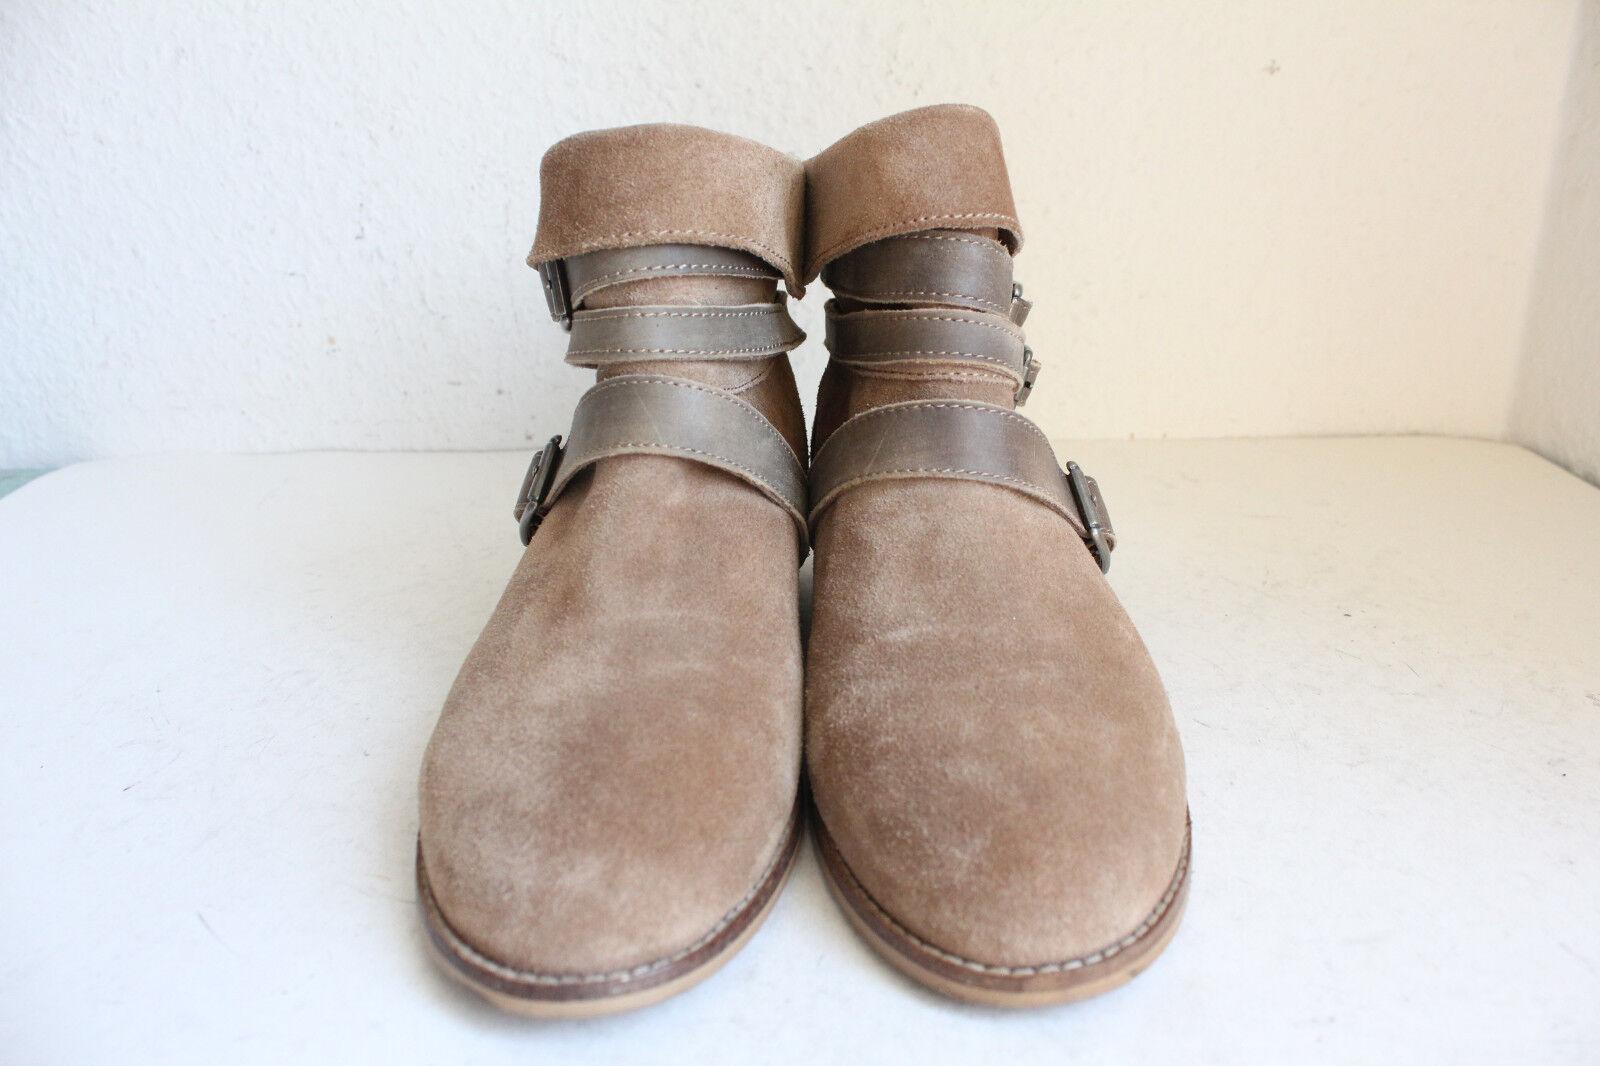 Esprit elegante trendy botines botas de gamuza marrón tonos eu 40